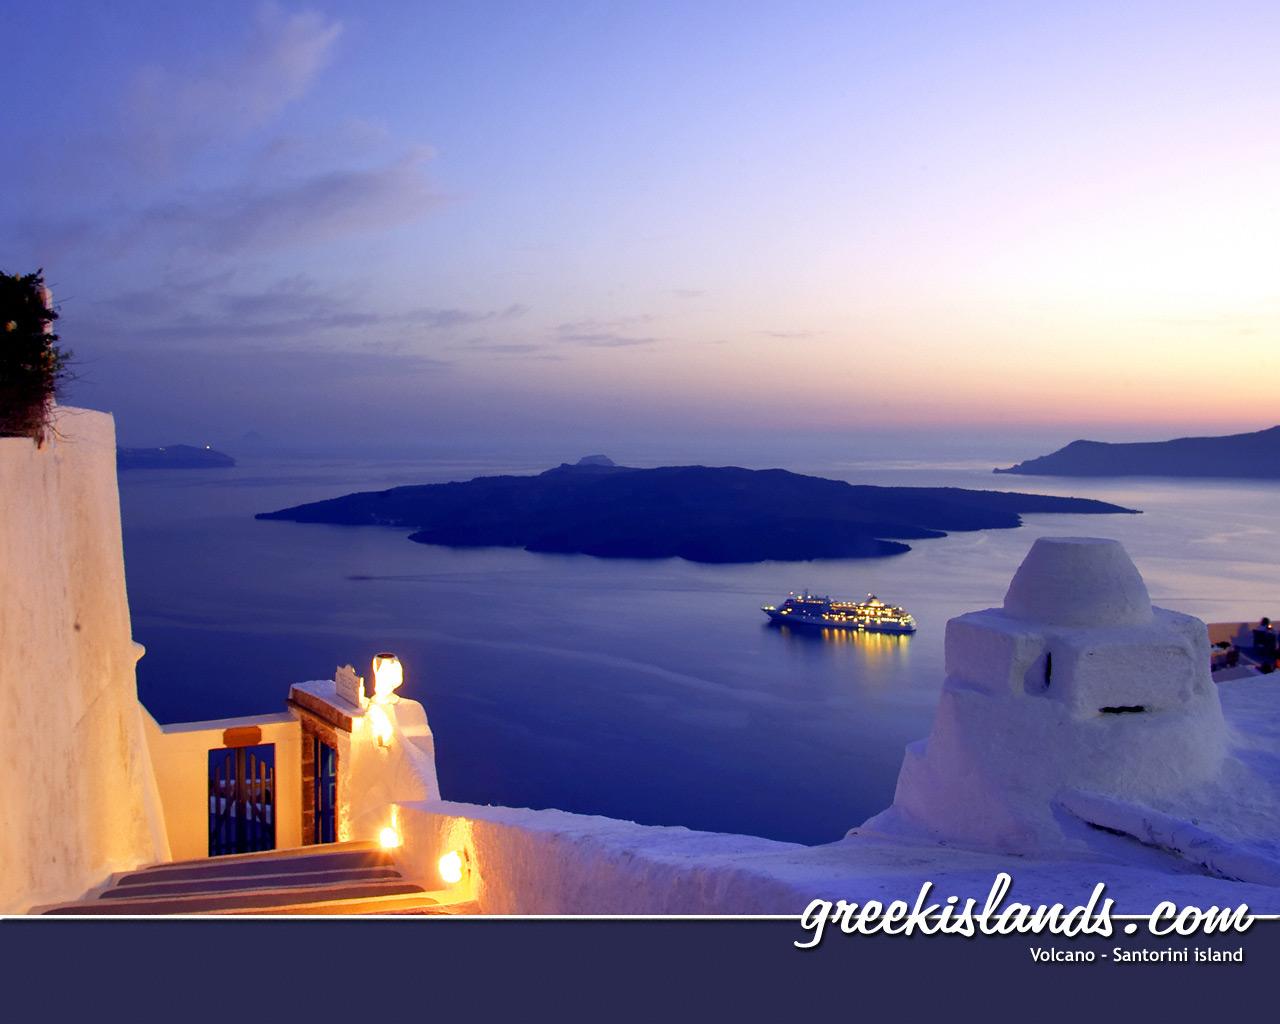 wallpaper santorini greece island - photo #35